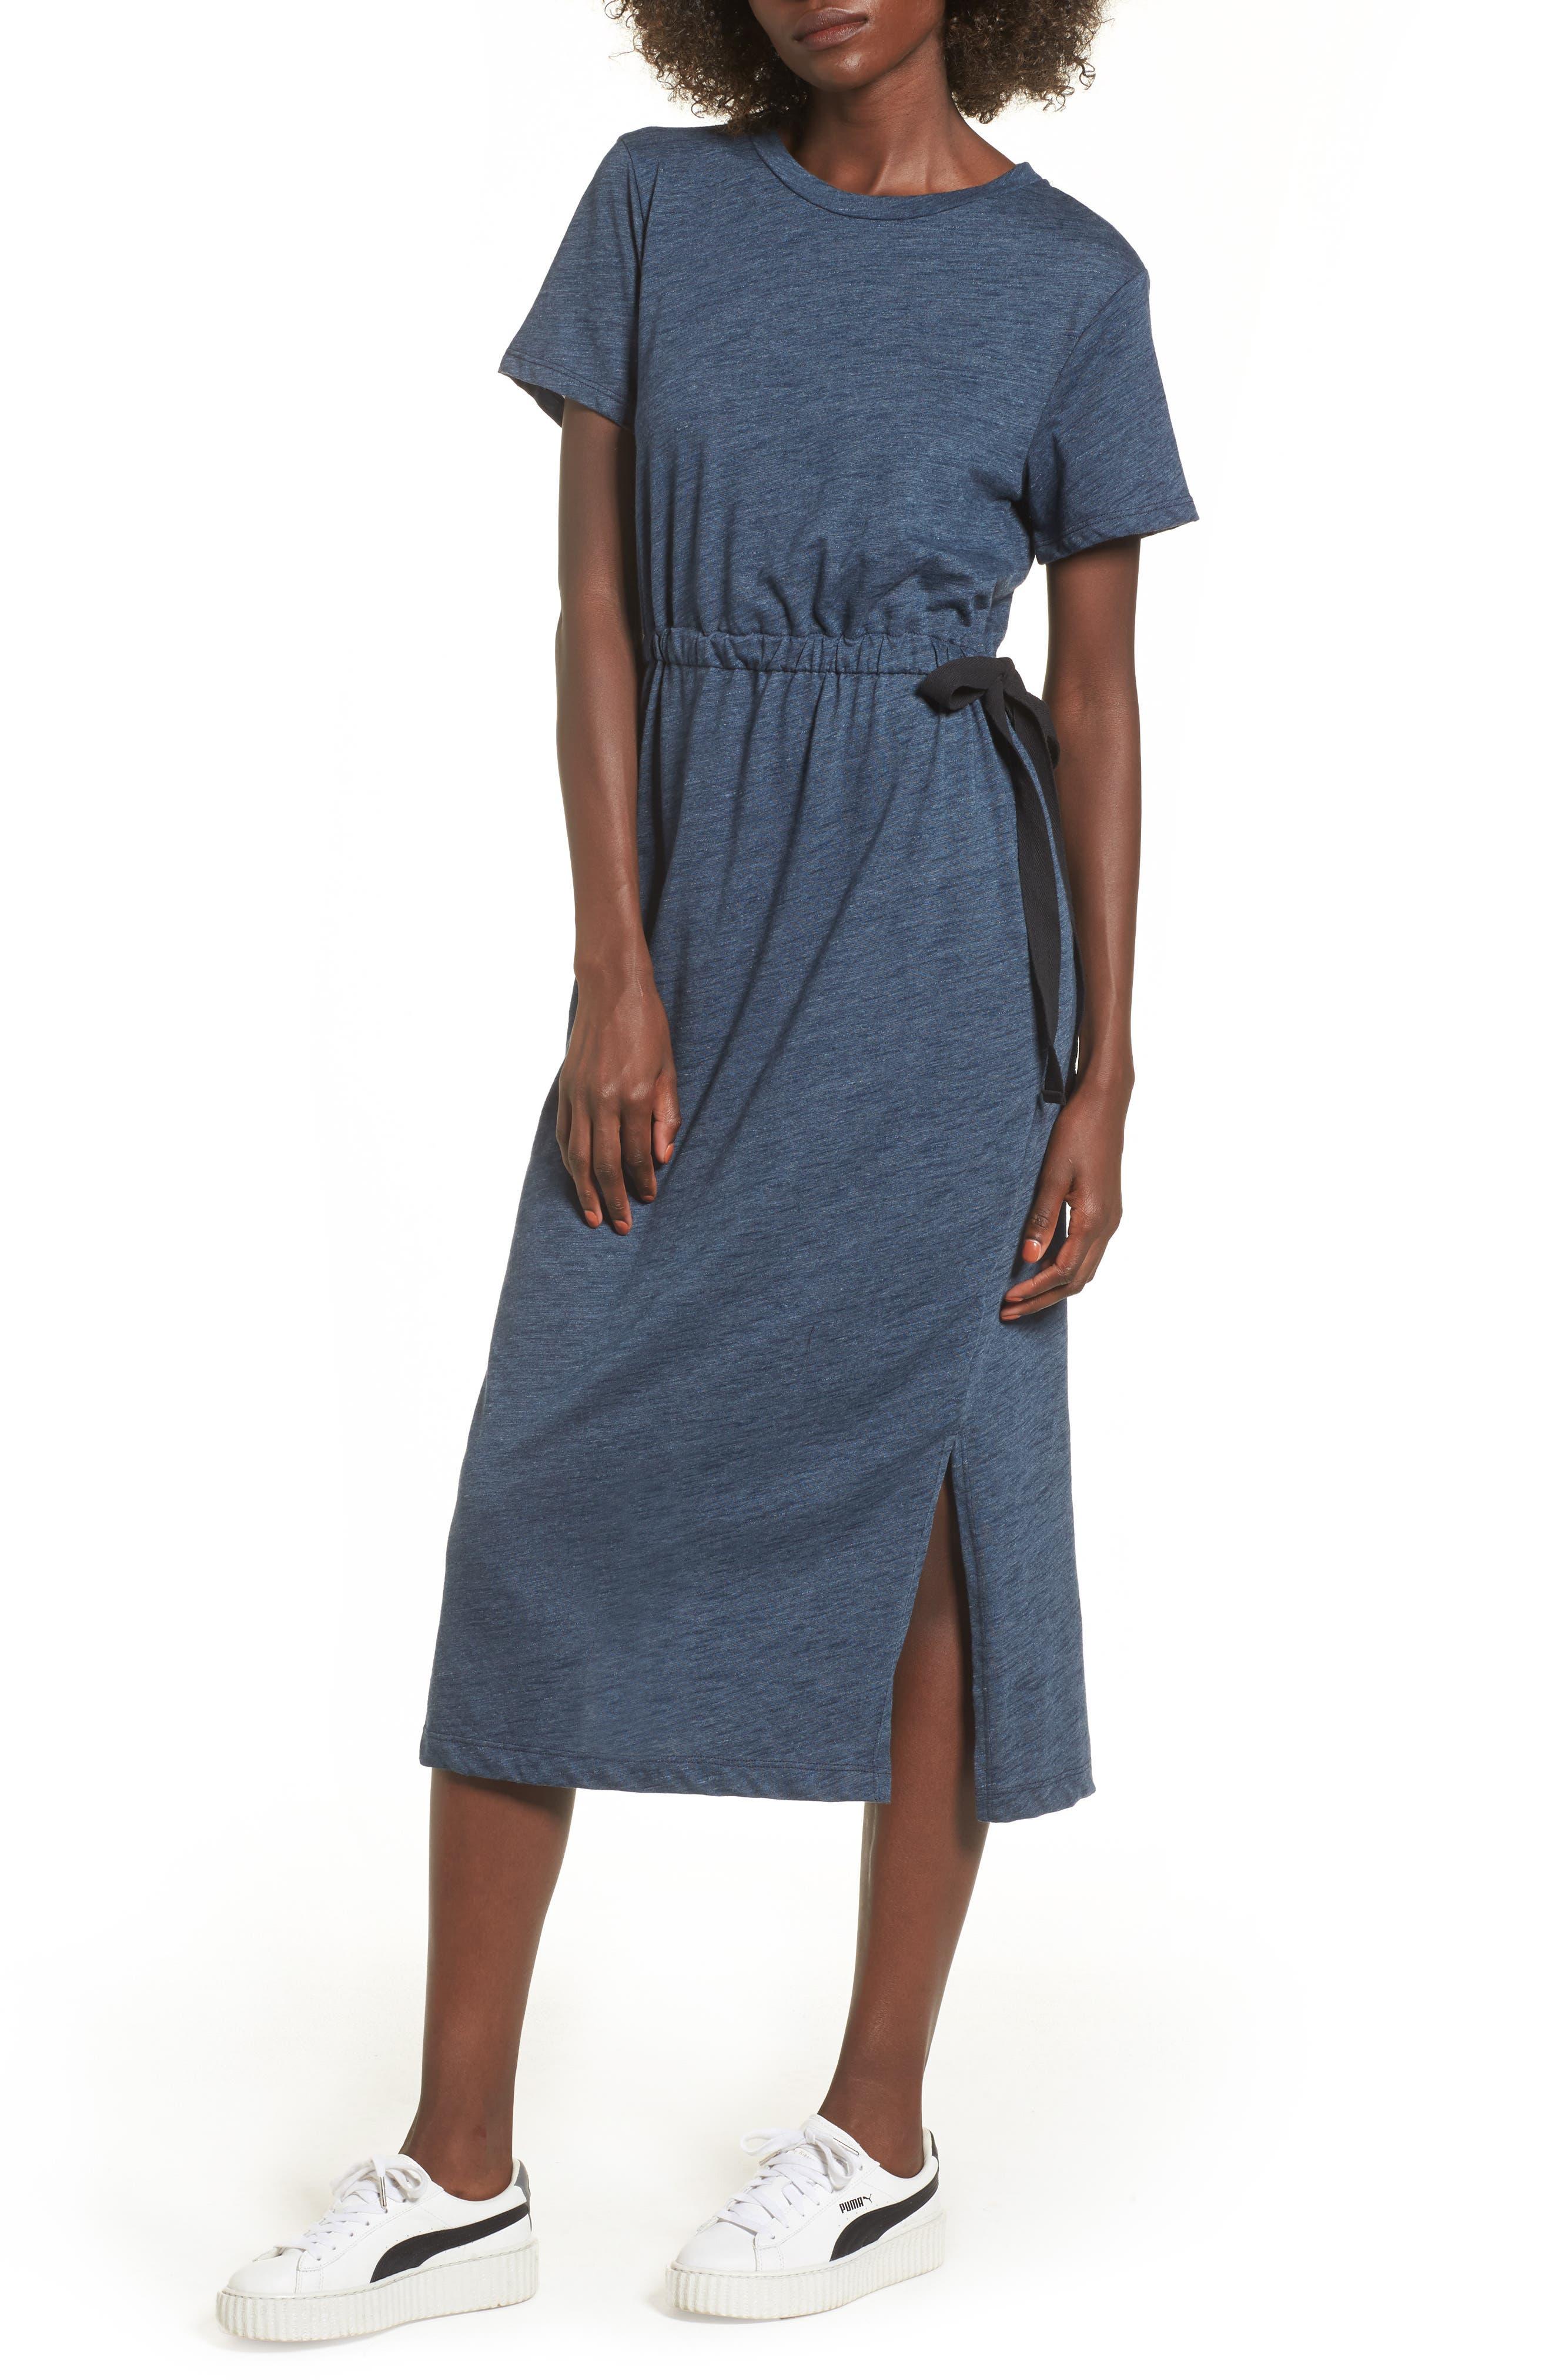 Main Image - Side Tie Midi T-Shirt Dress